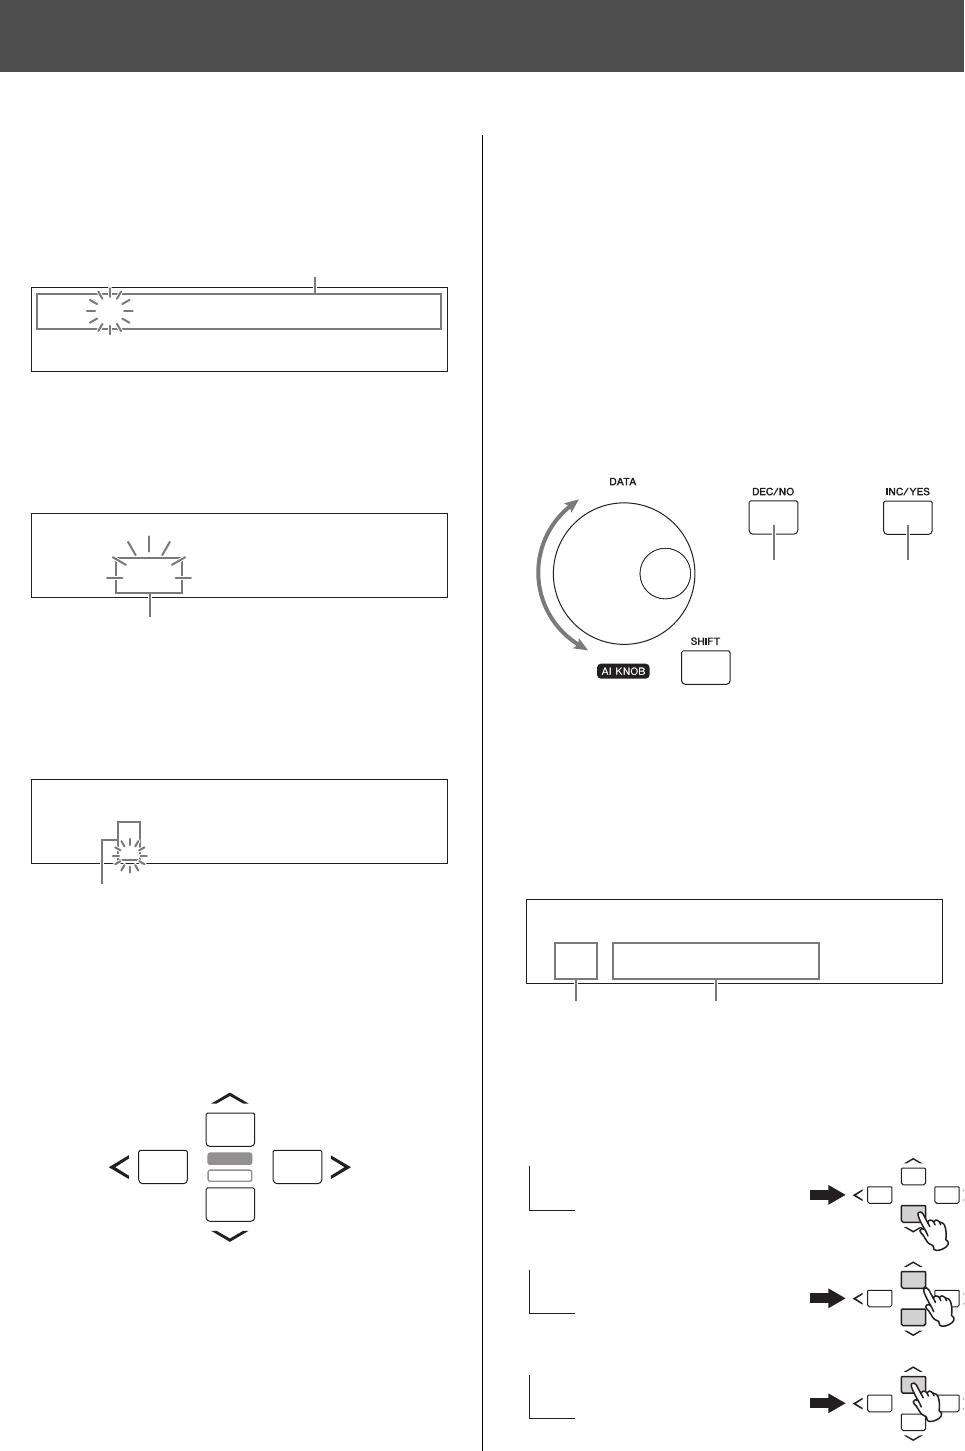 Yamaha MX49MX61MX88 Owner's Manual MX49 BK/BU/WH, MX61